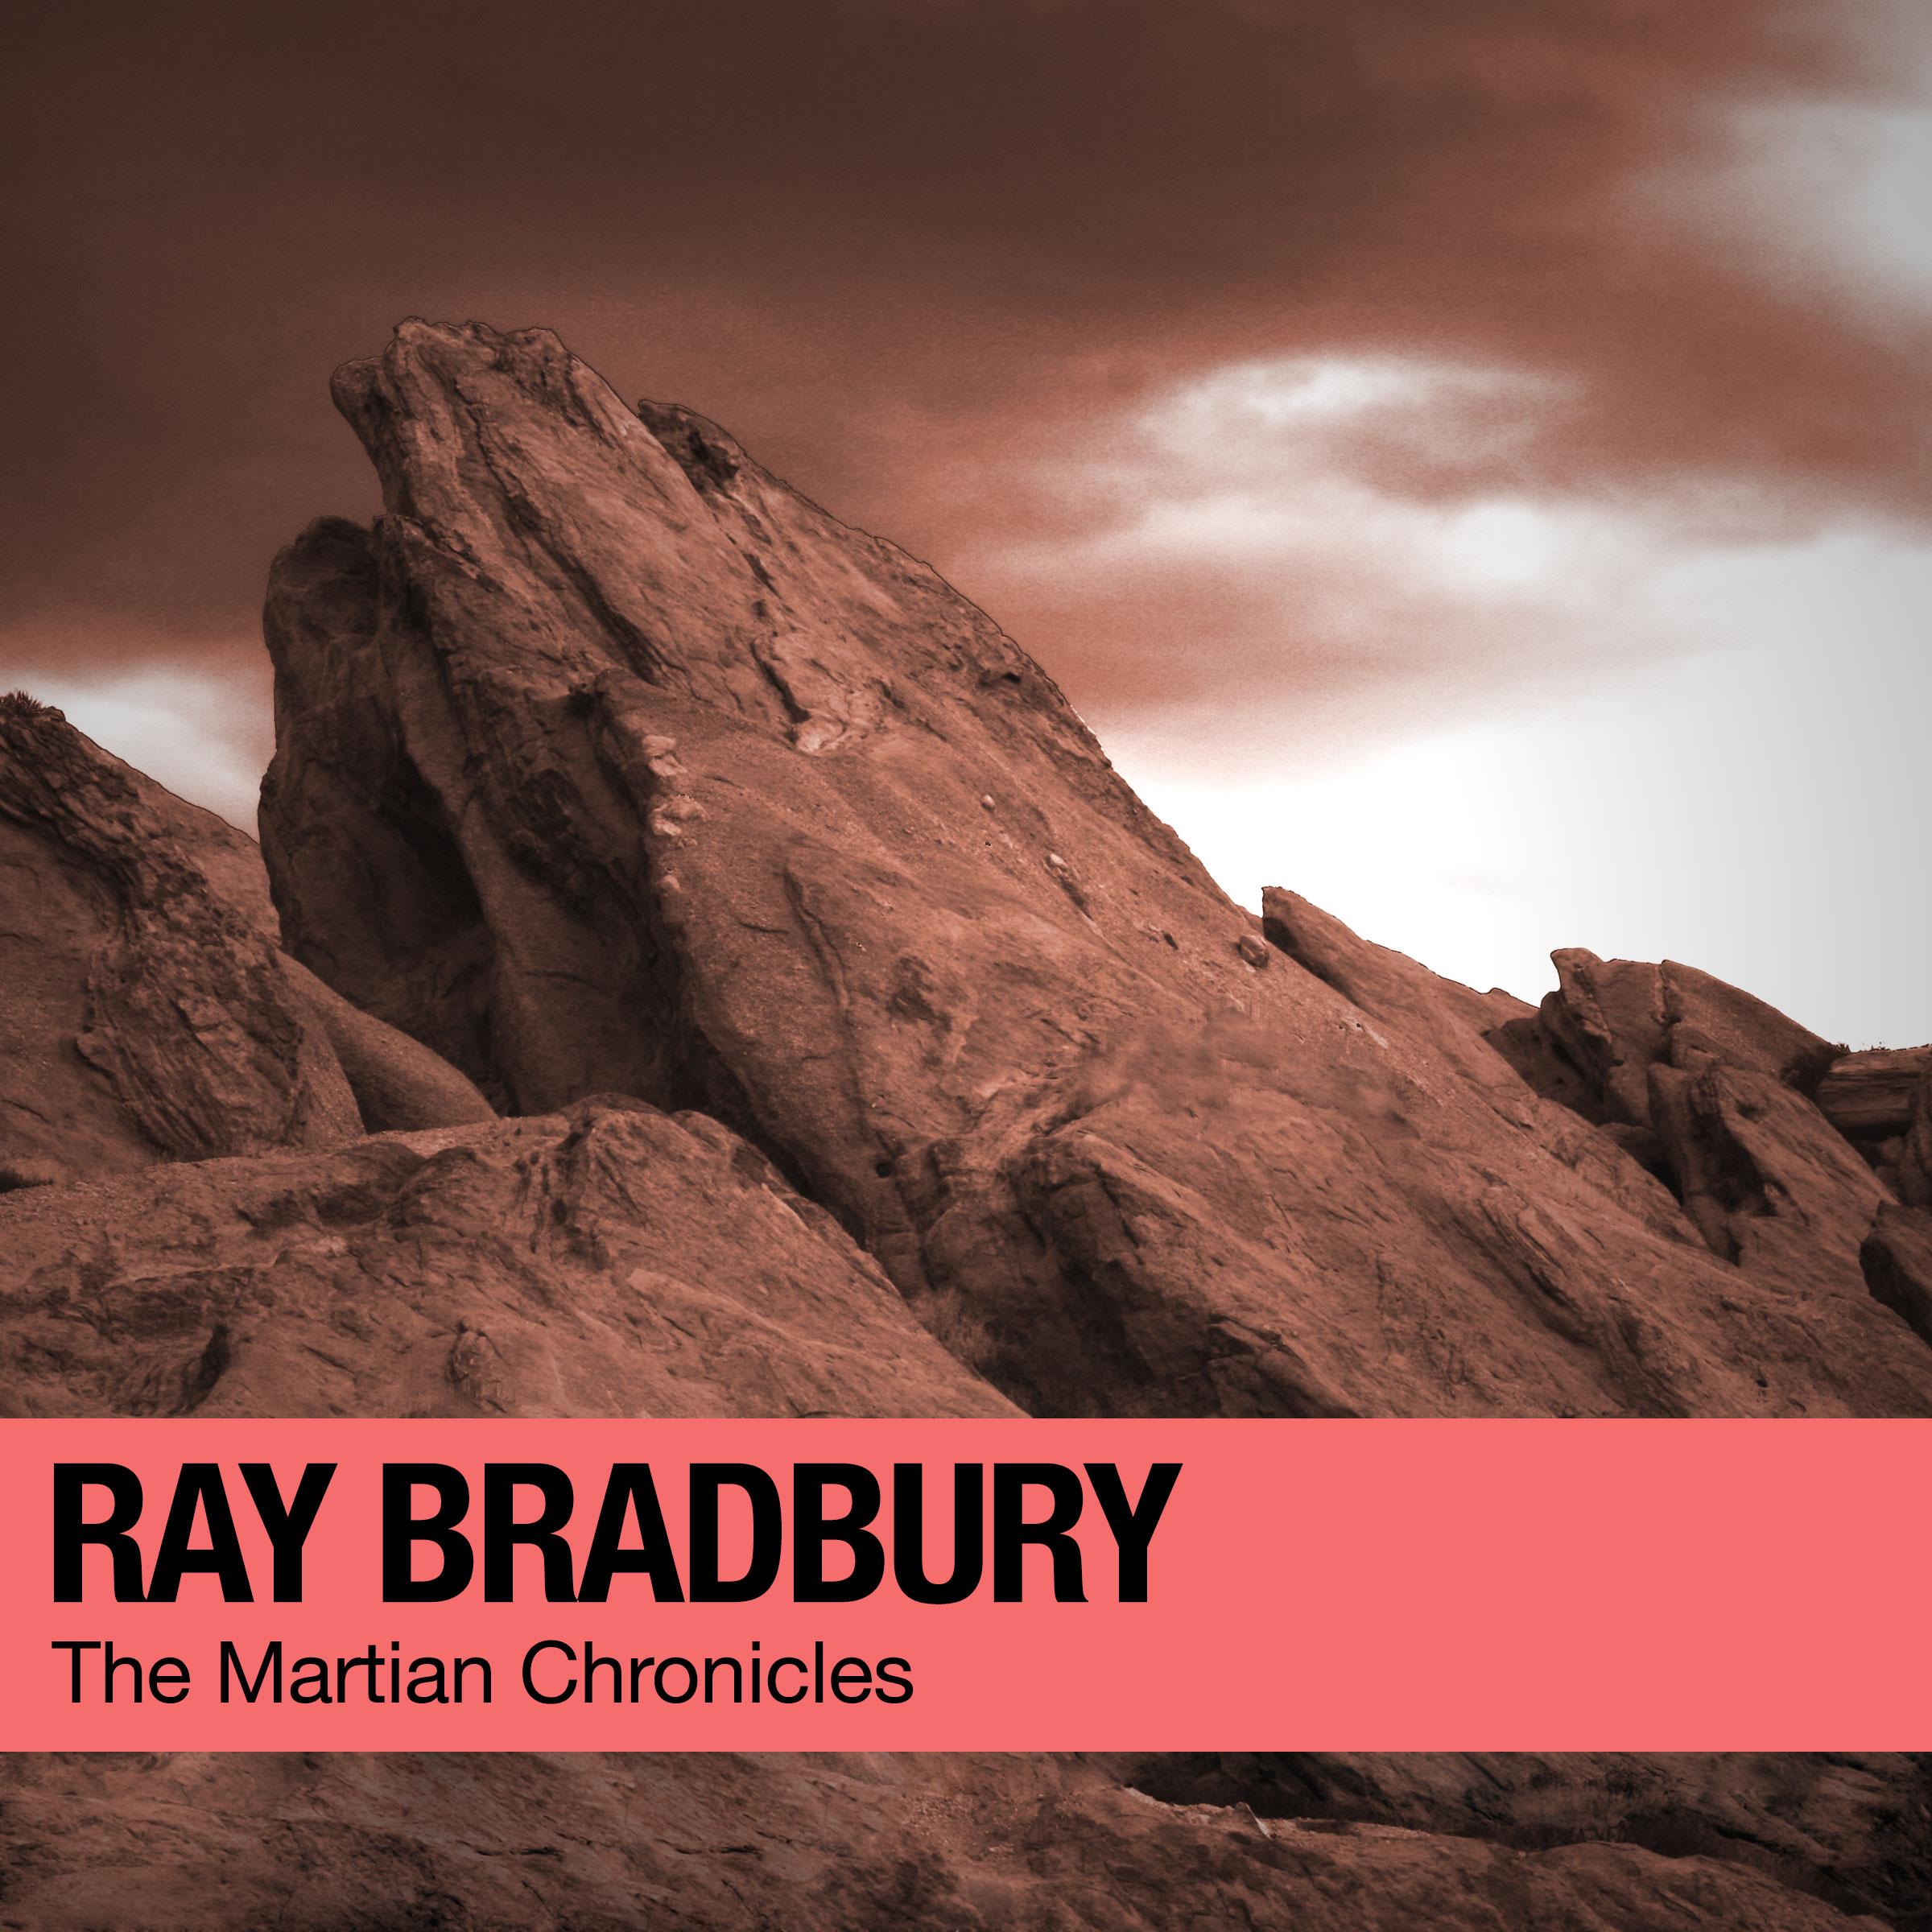 ADBLCRE-3712-Create-Covers-Ray-Bradbury-The-Martian-Chronicles-v3.jpg